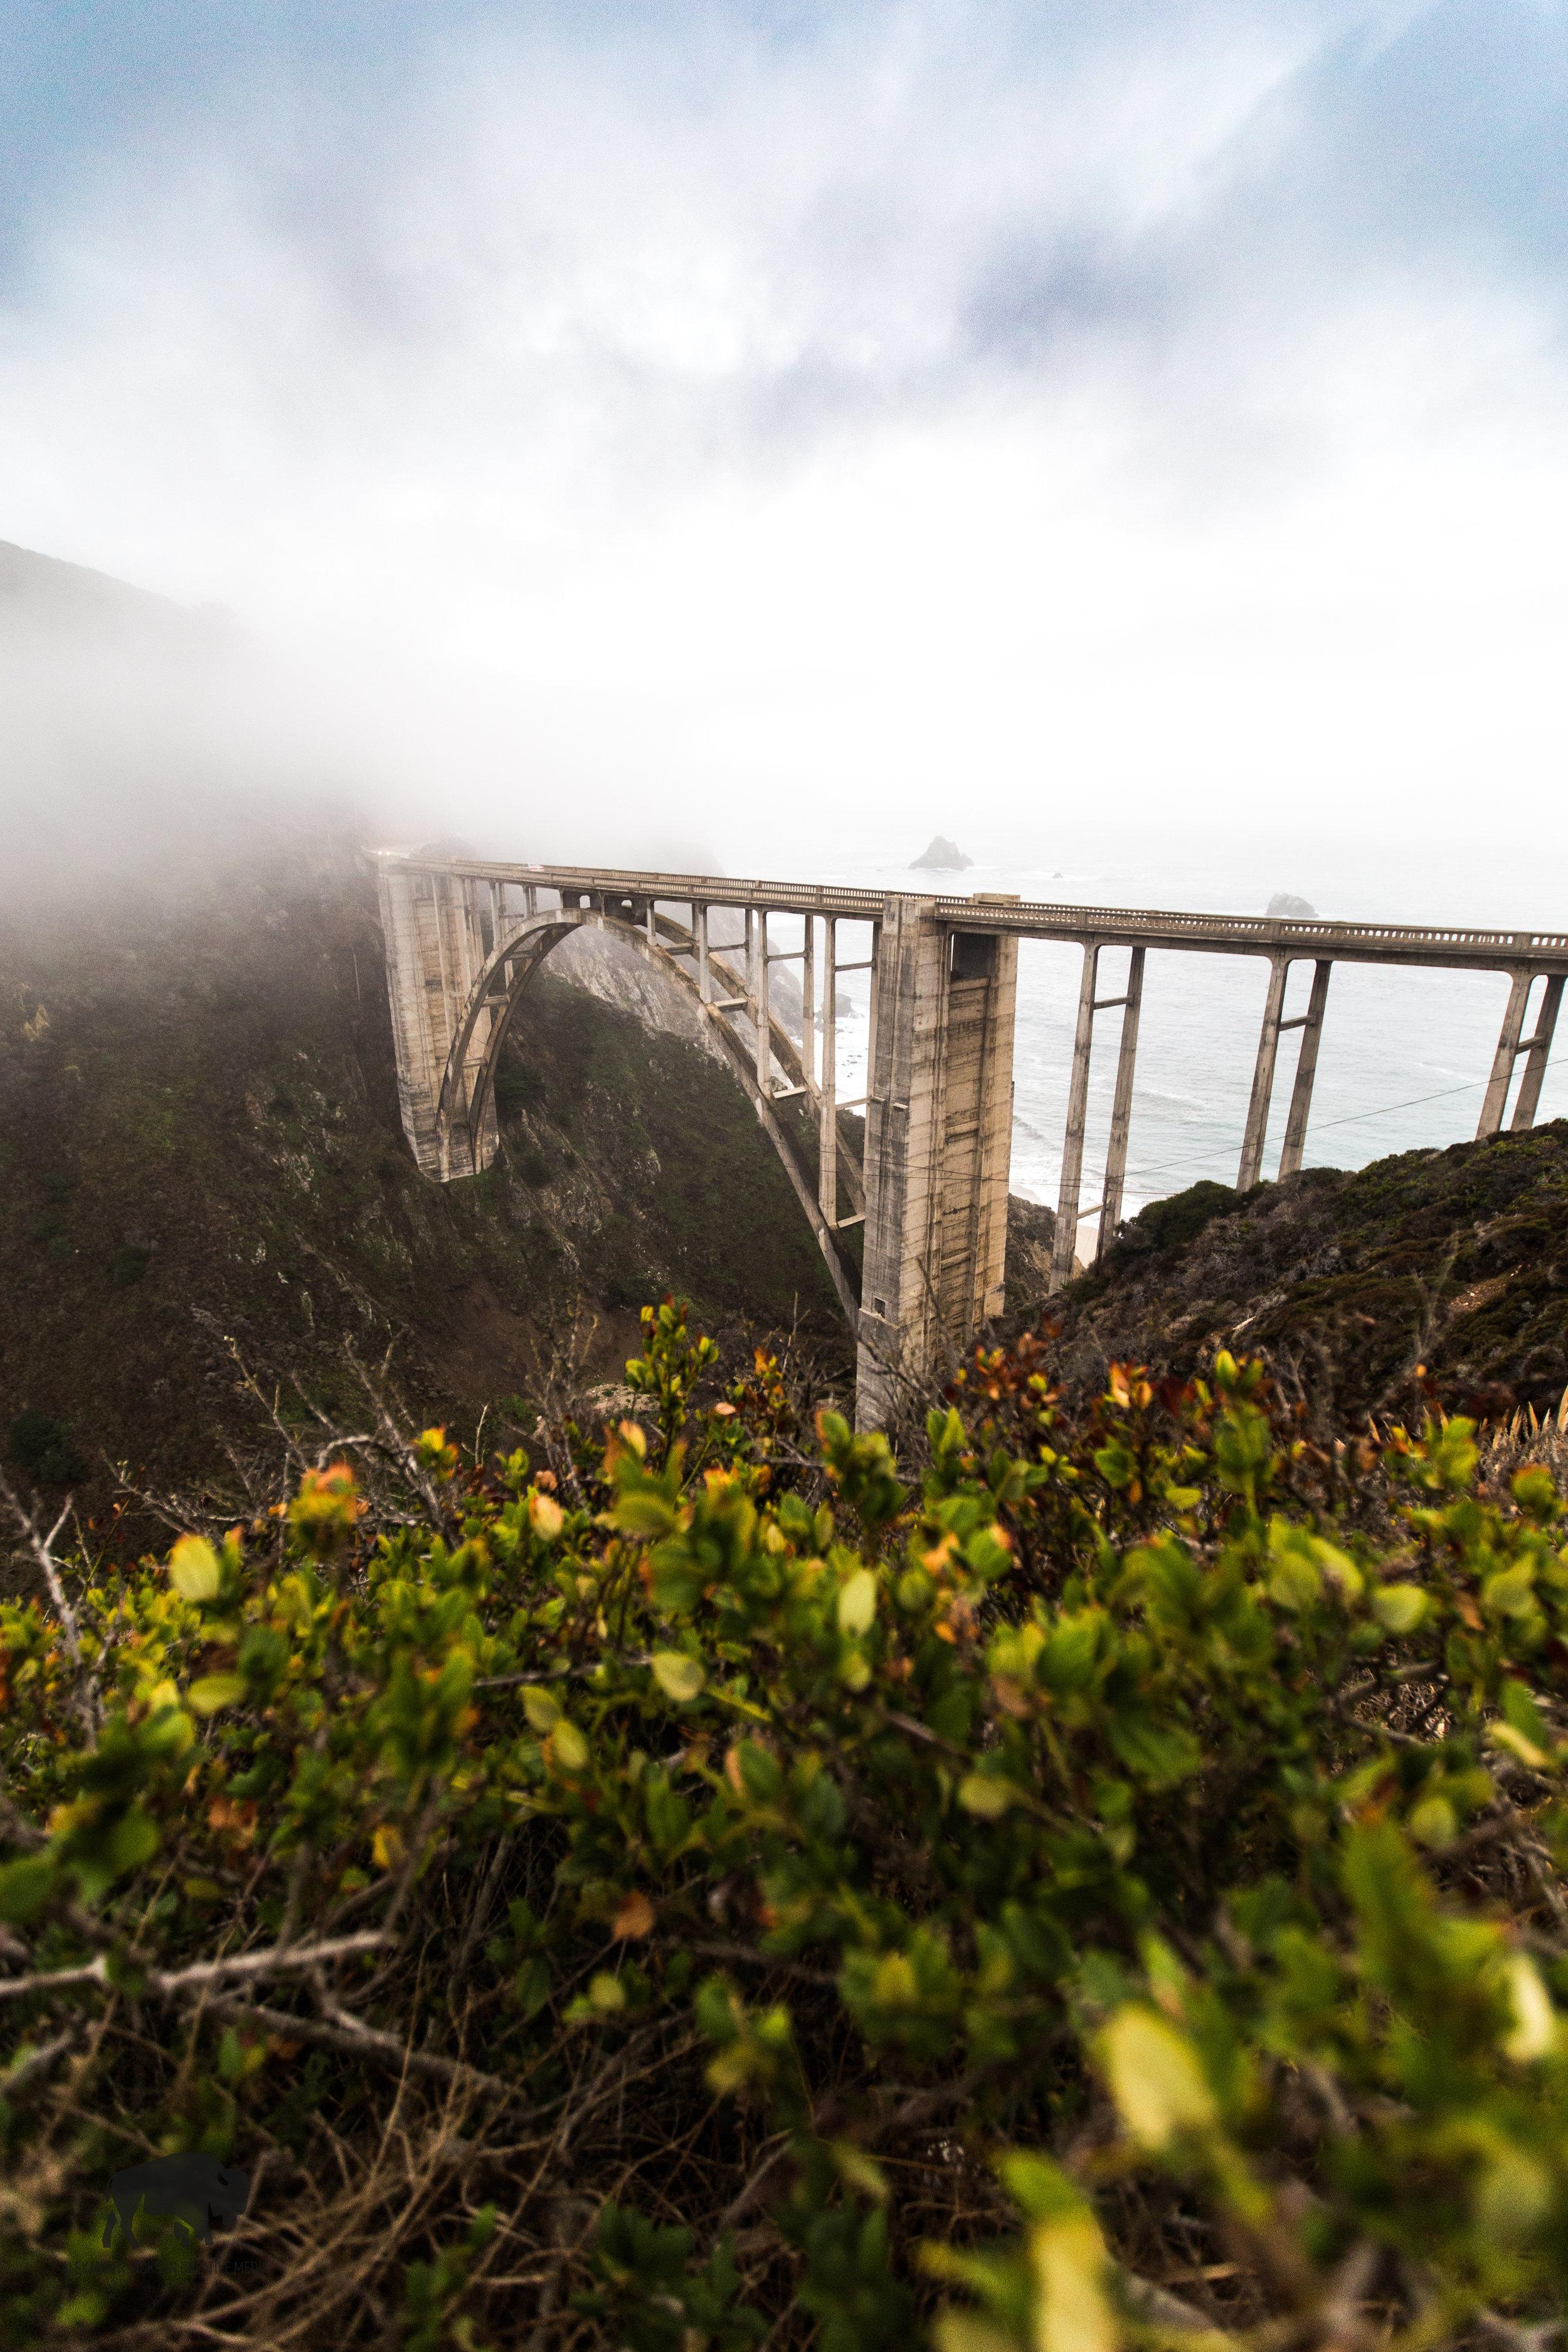 Bixby Bridge on the CA1 South of Monterey, California.